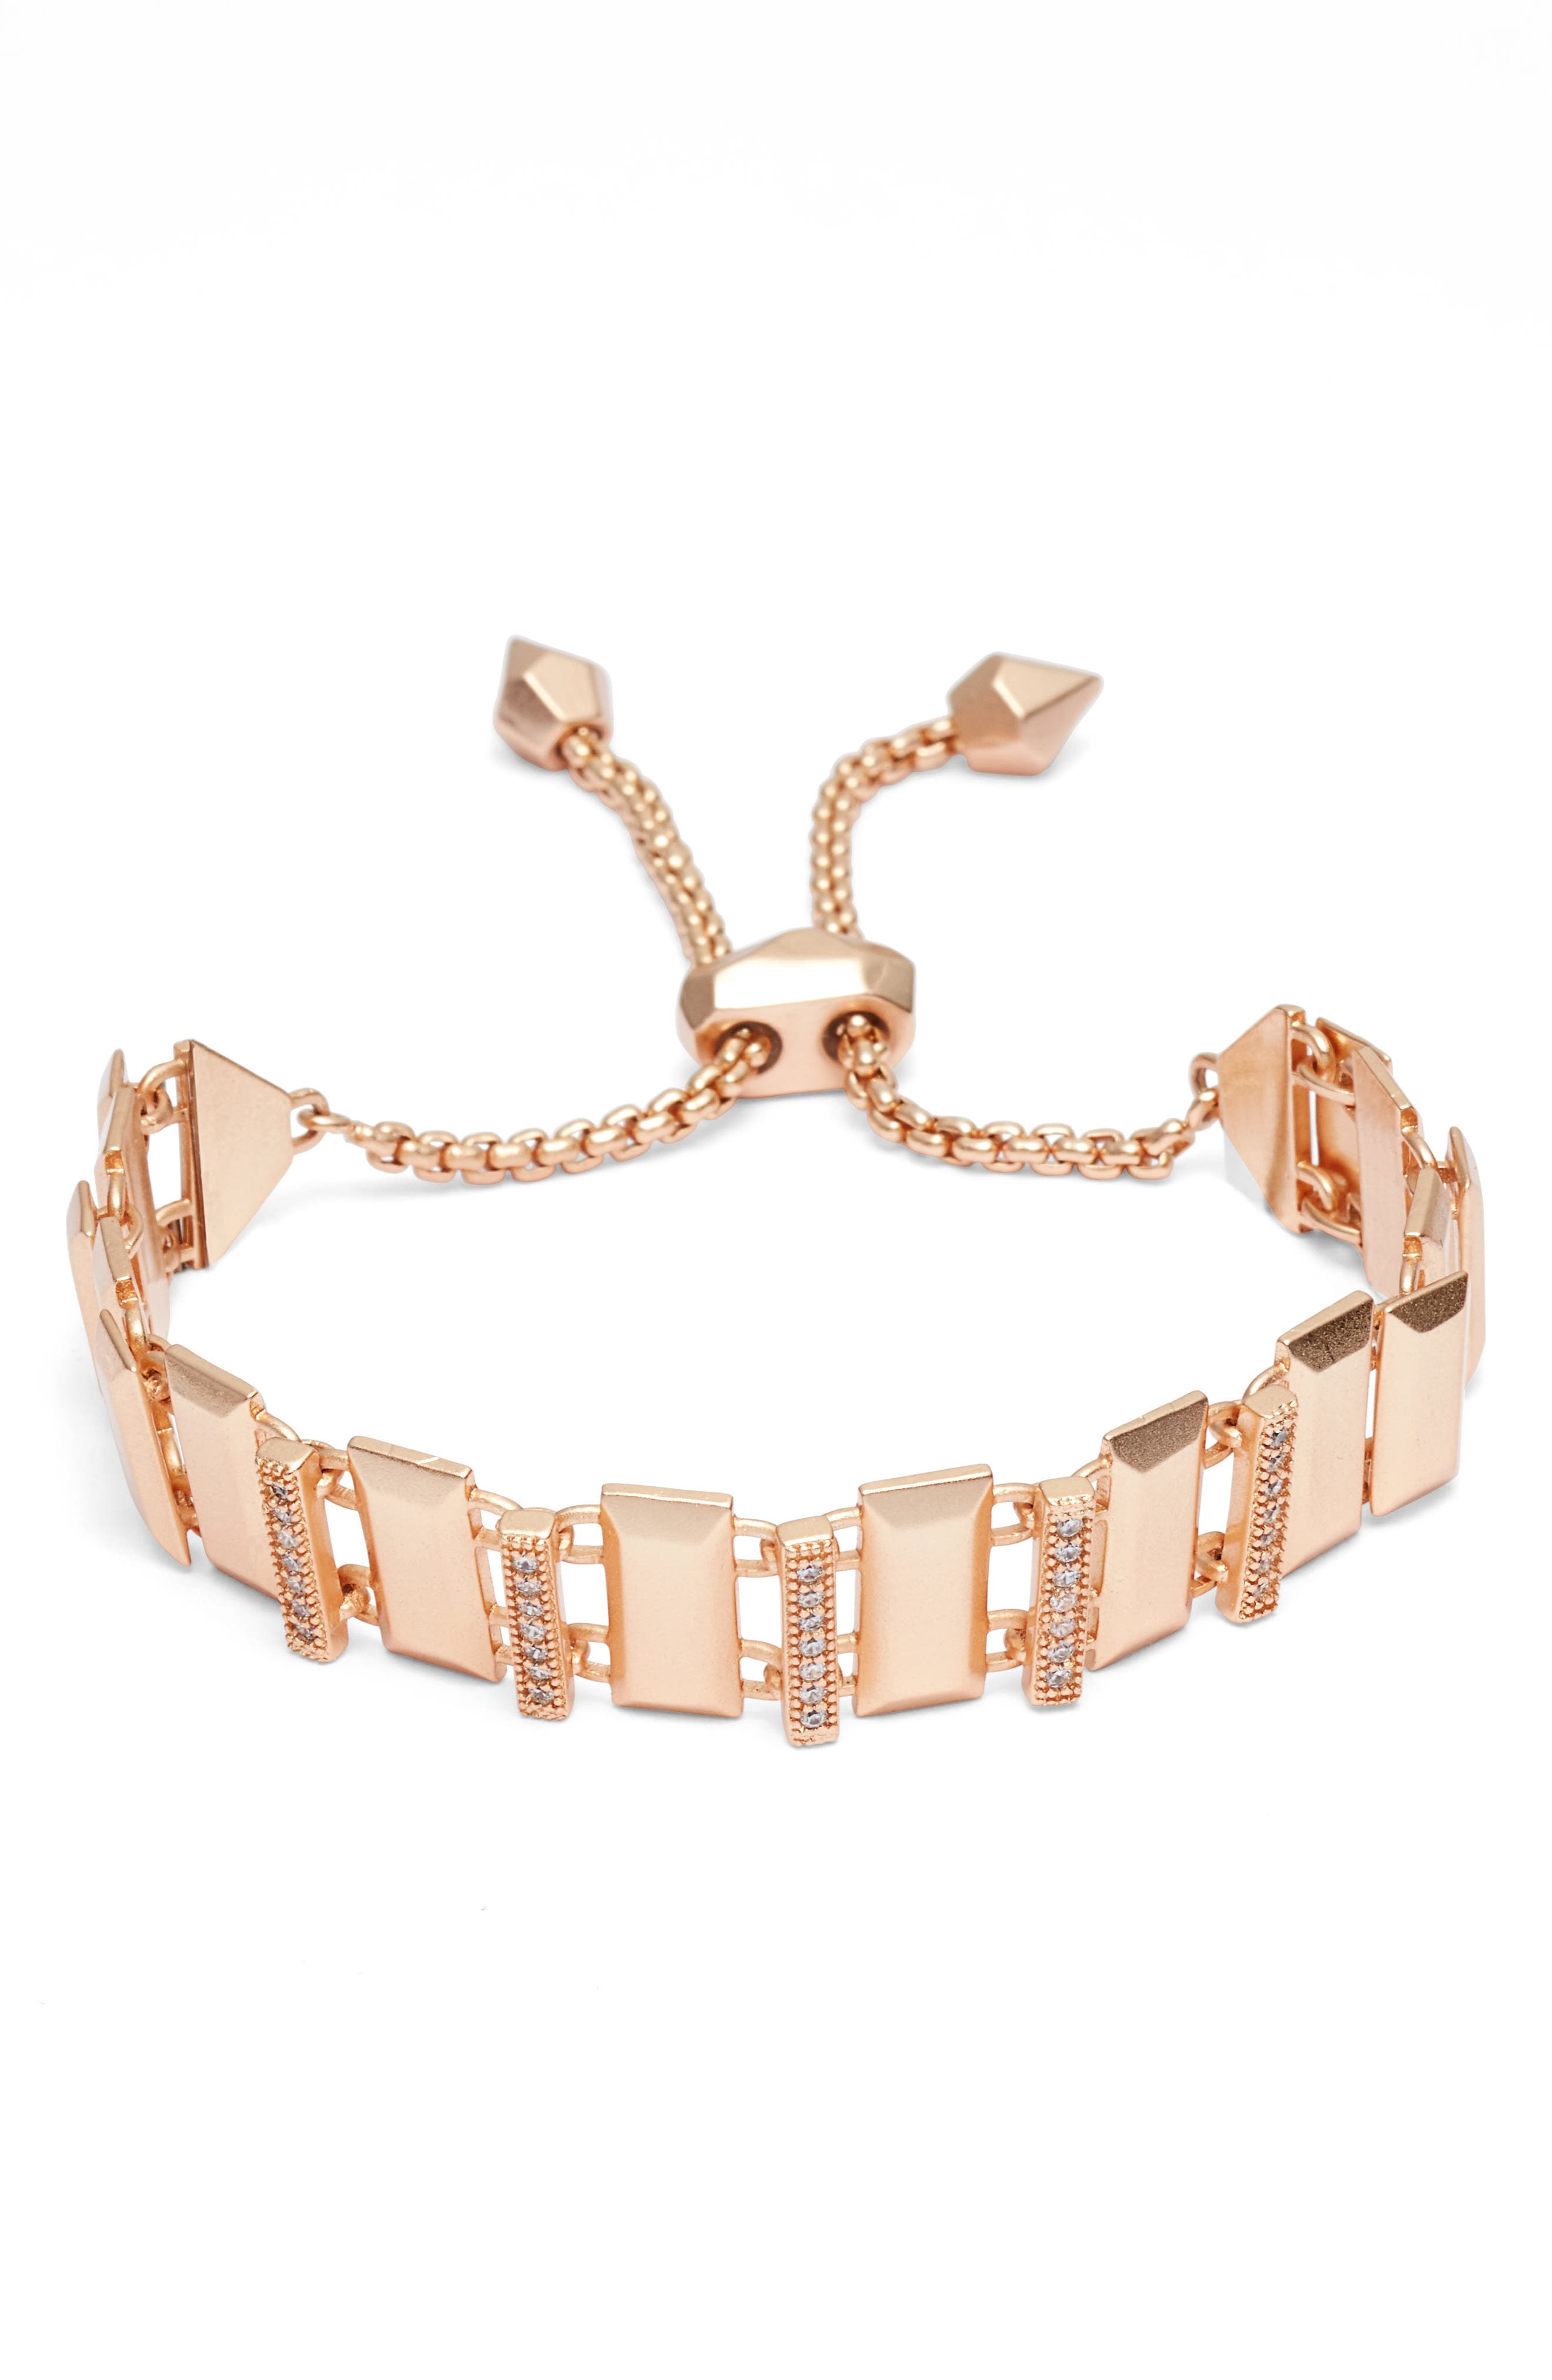 Kendra Scott Harp Friendship Bracelet